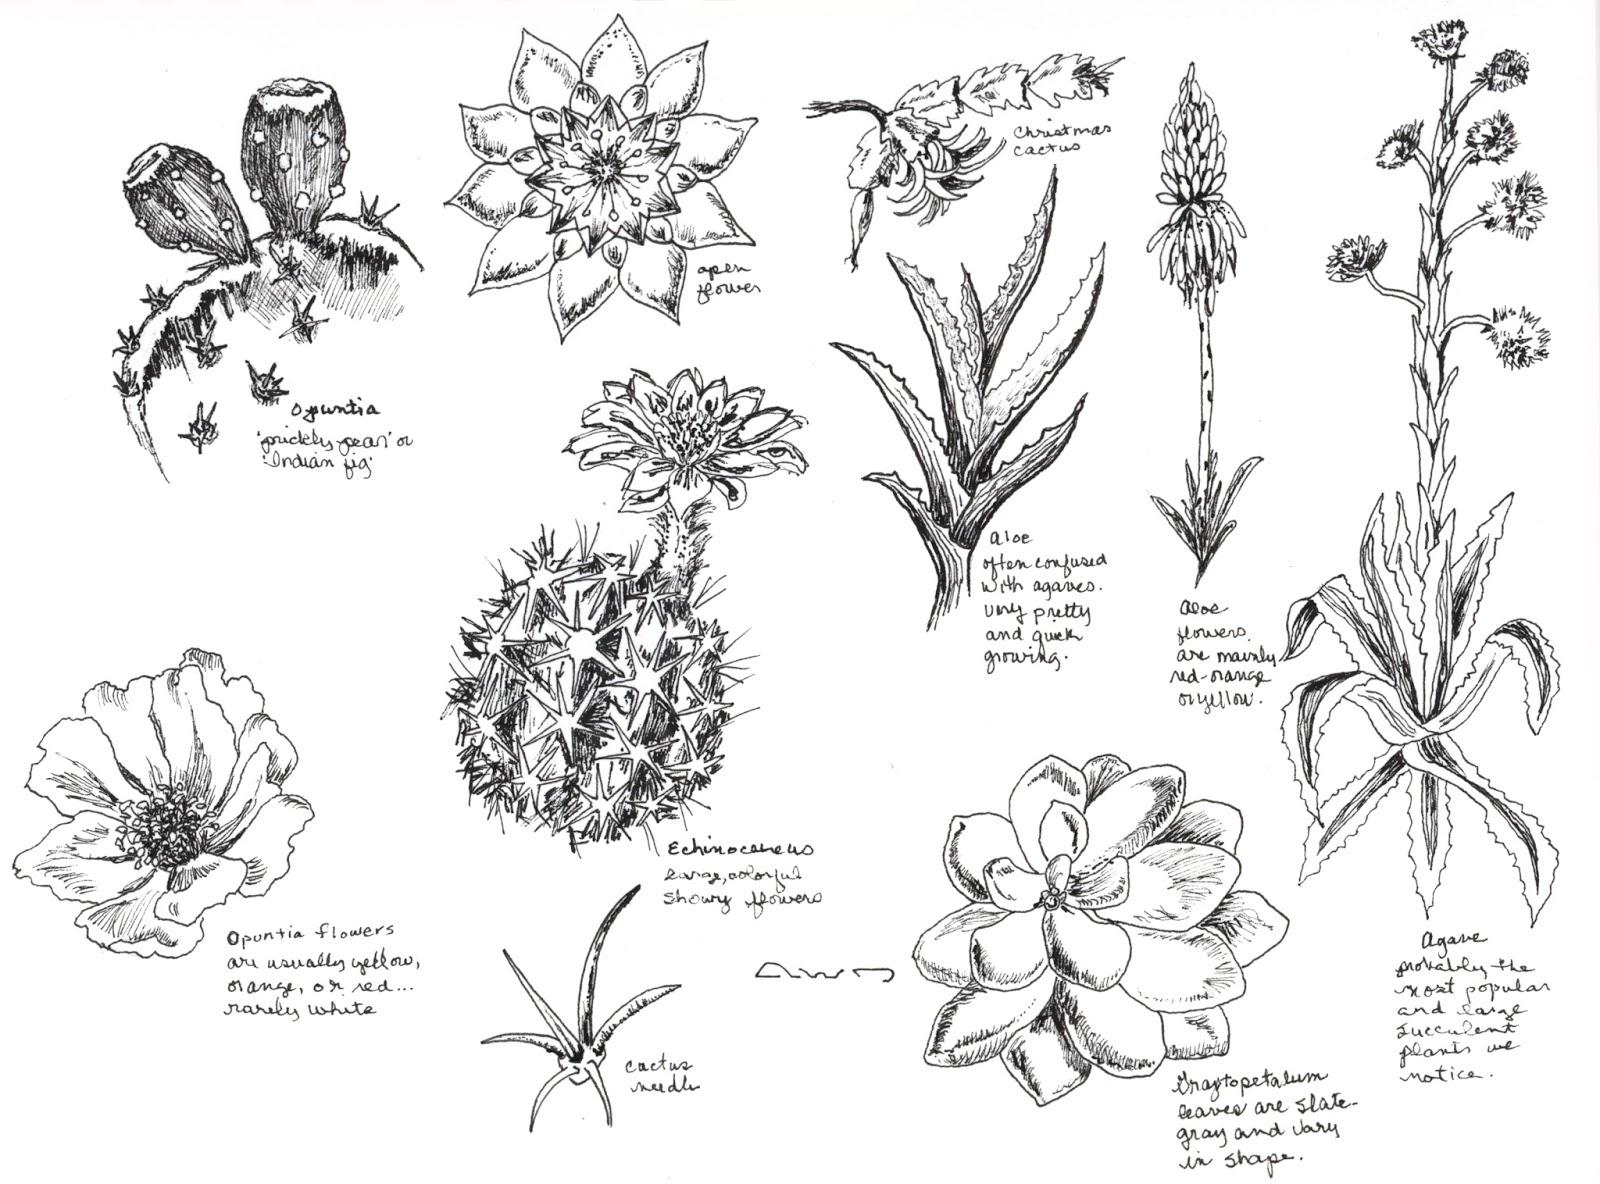 Line Drawing Cactus : Dianne jansing art cactus ink drawings